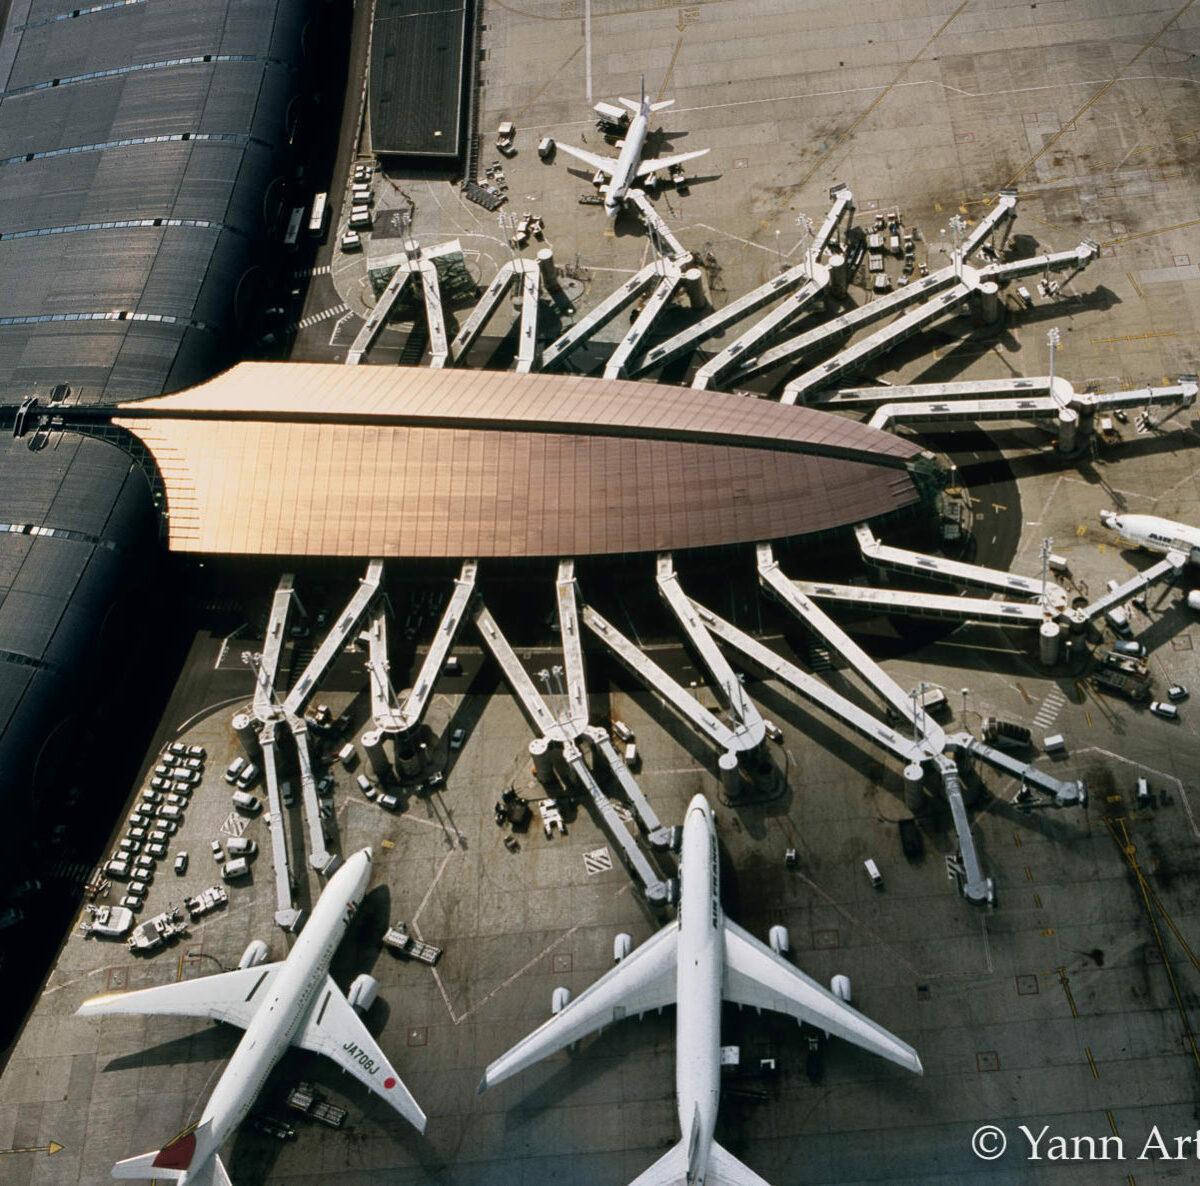 aéroport Roissy-Charles-de-Gaulle YAB